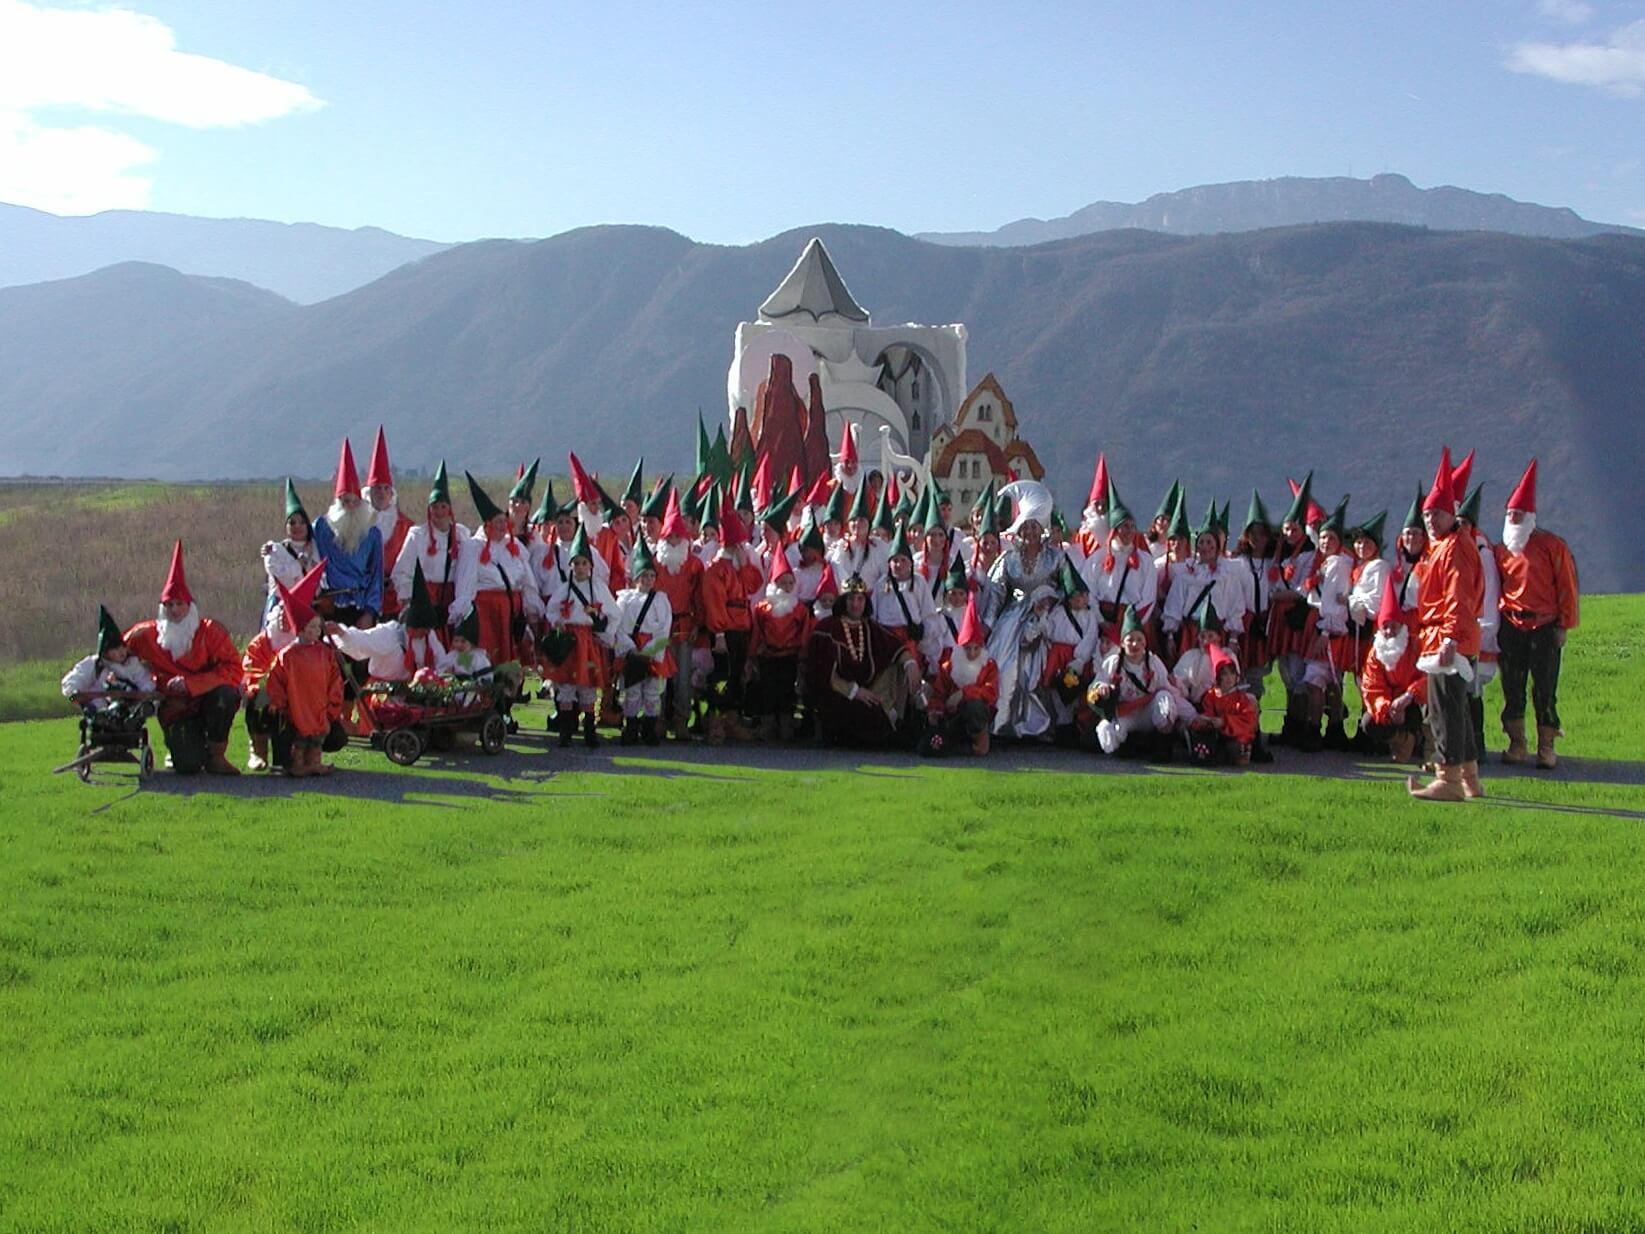 La leggenda dei Monti Pallidi 2007 Gruppo Carnevalesco